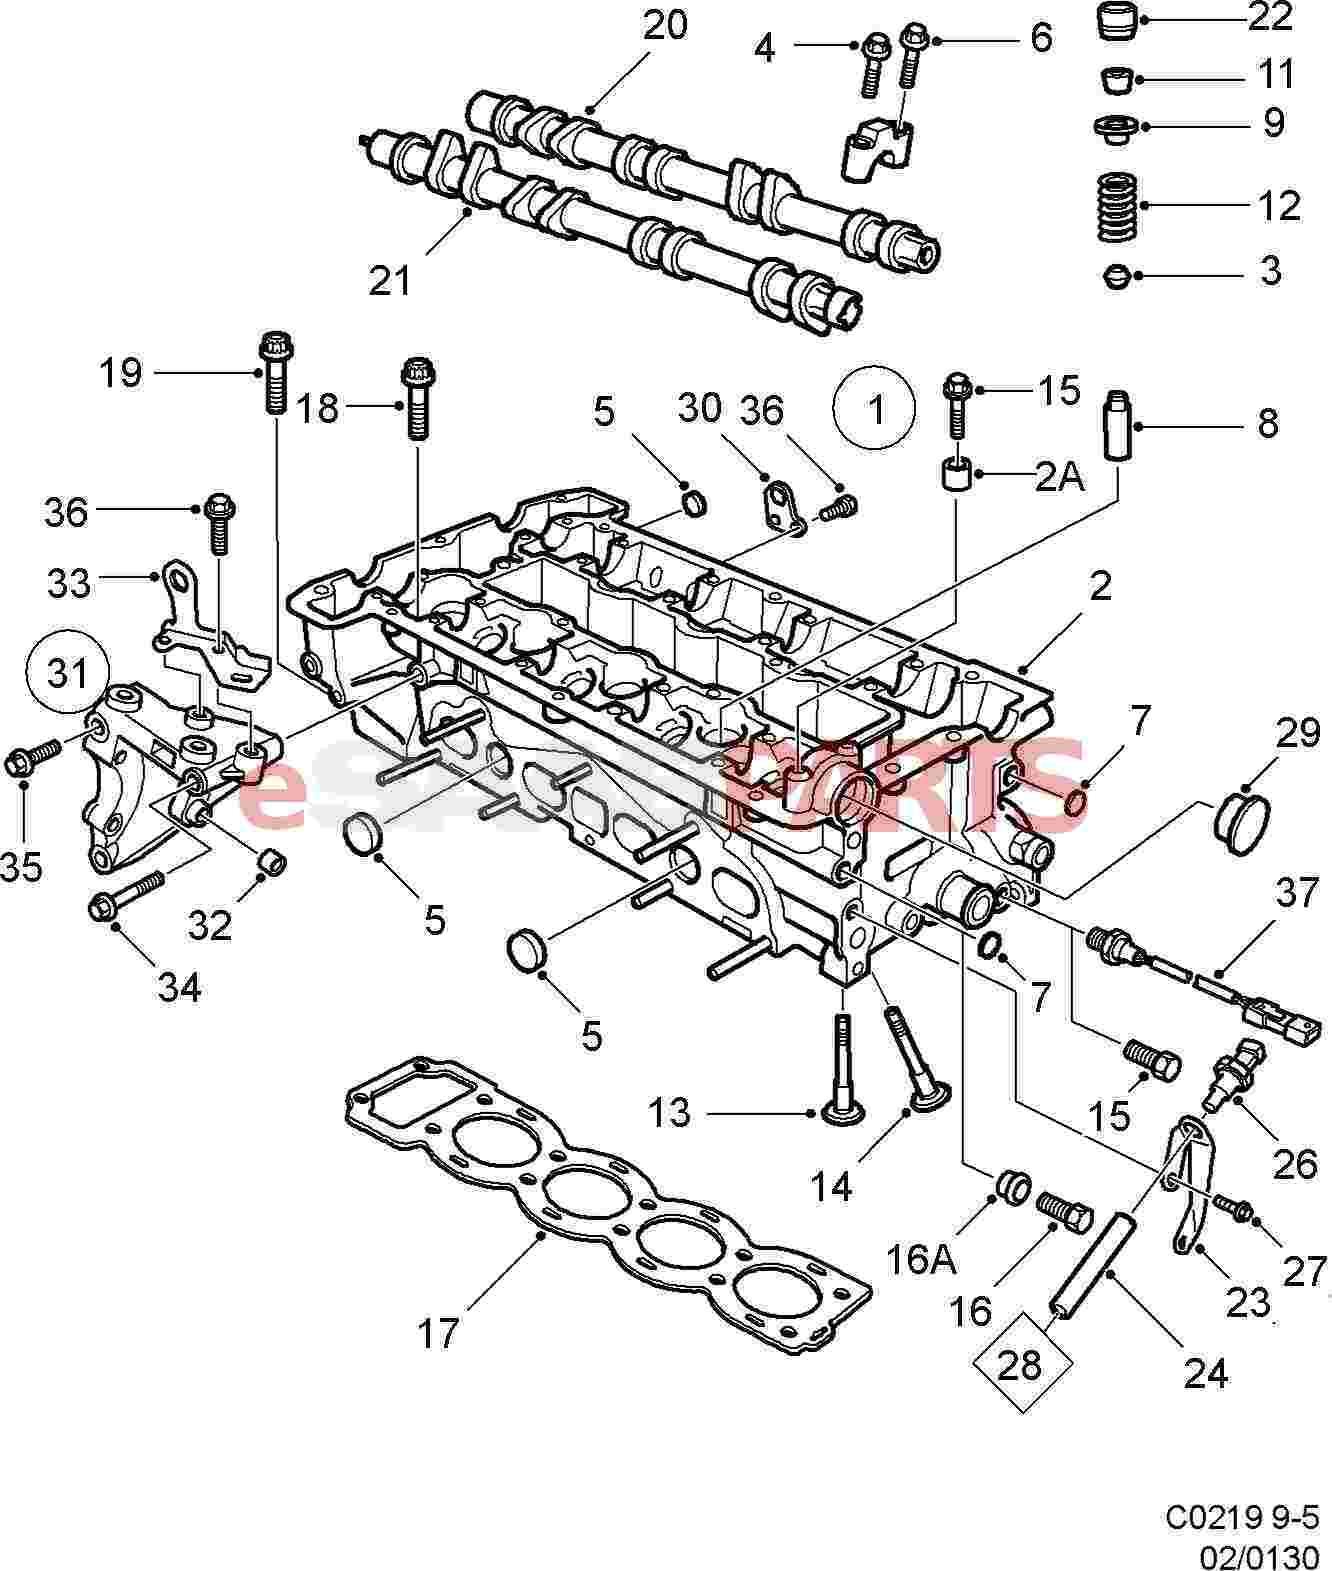 hight resolution of 2000 jetta 2 0 engine diagram 2000 vw jetta suspension 1997 jetta engine diagram 1997 jetta